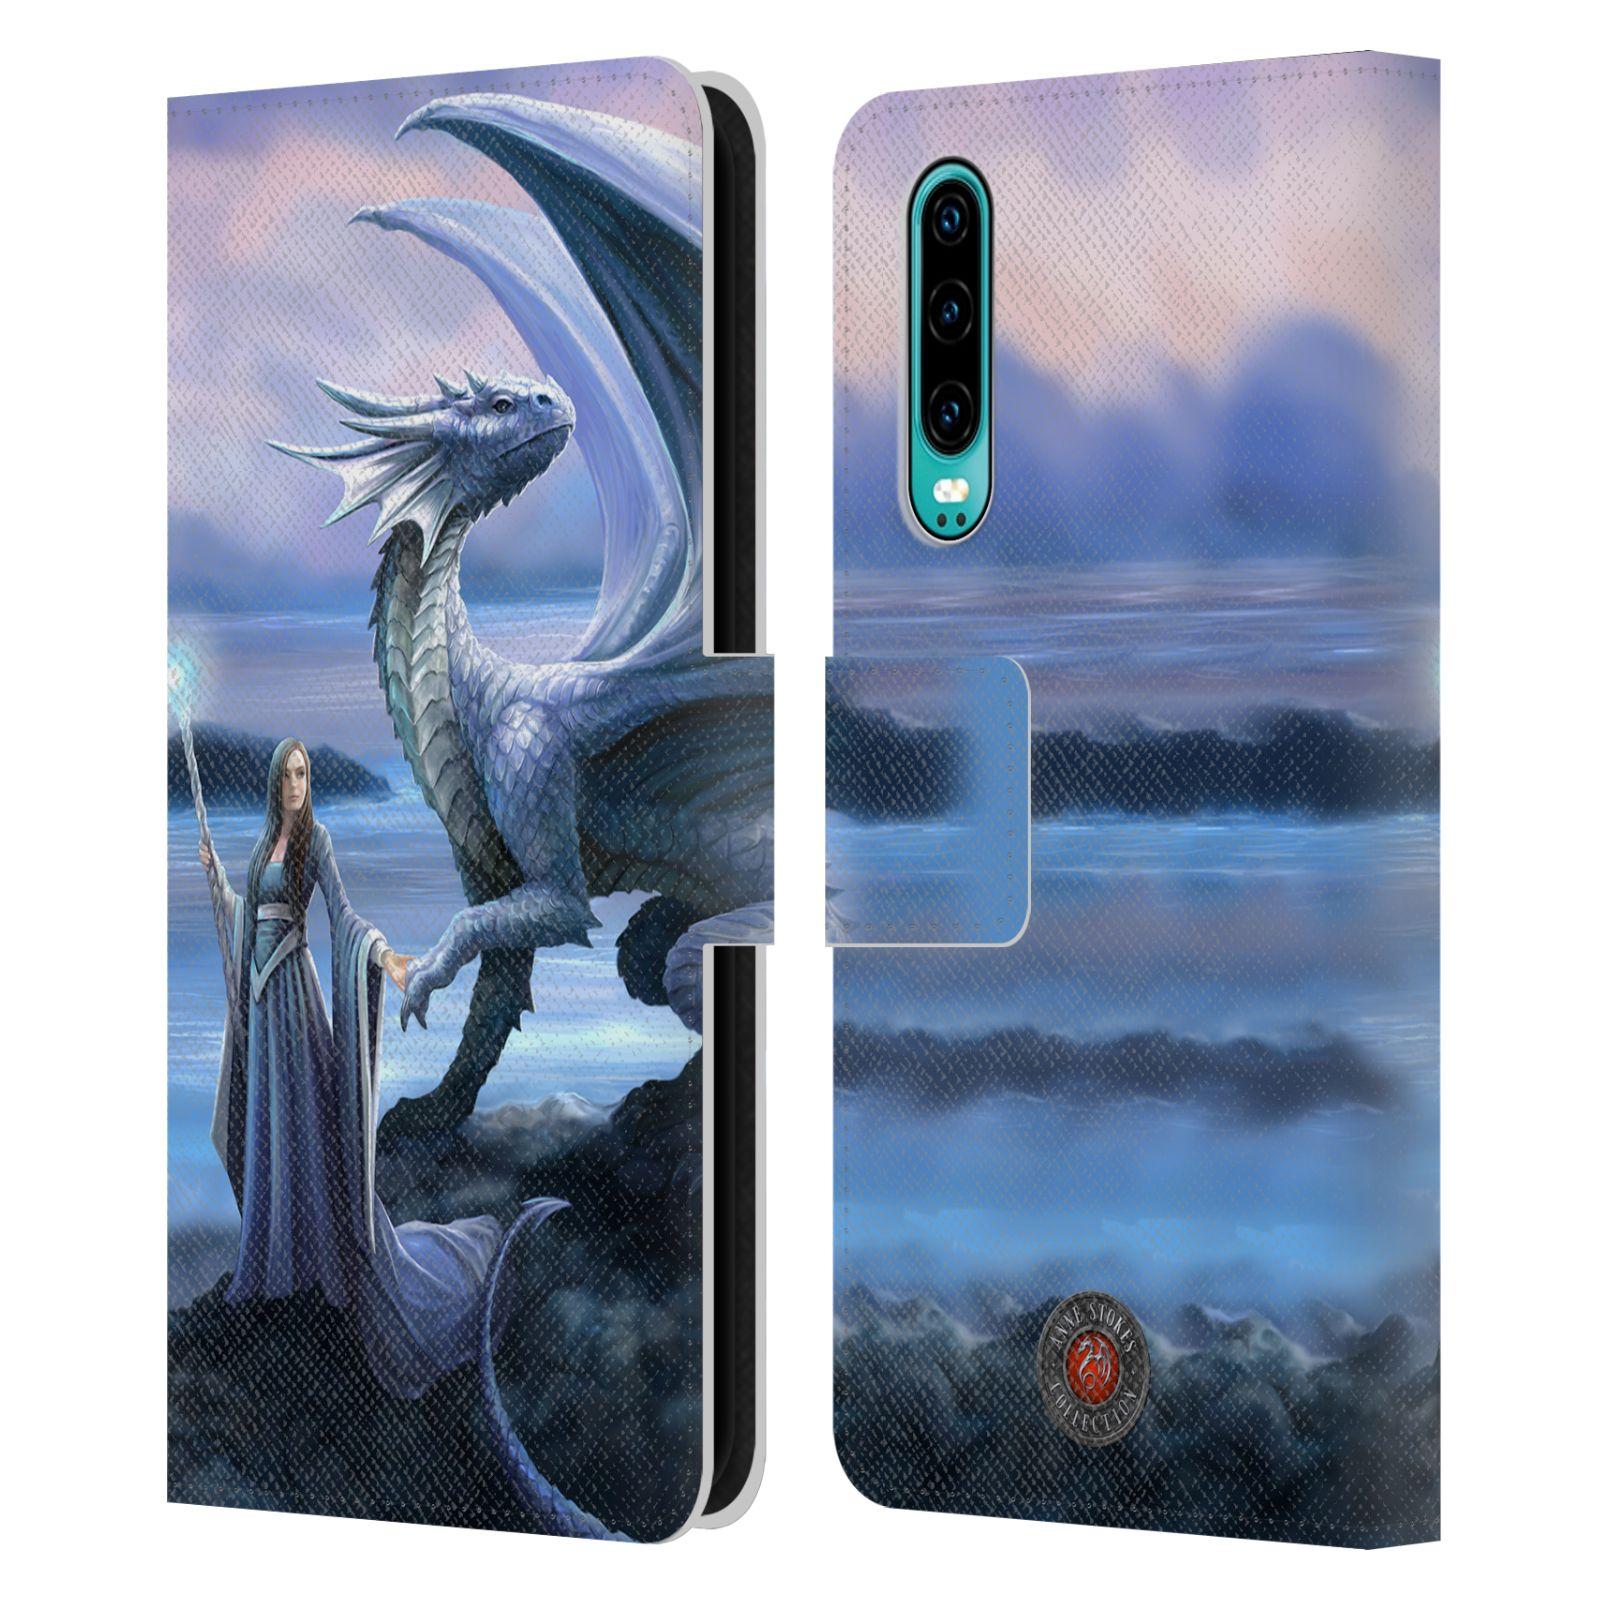 Pouzdro na mobil Huawei P30 - Head Case - fantasy - žena s drakem horizont